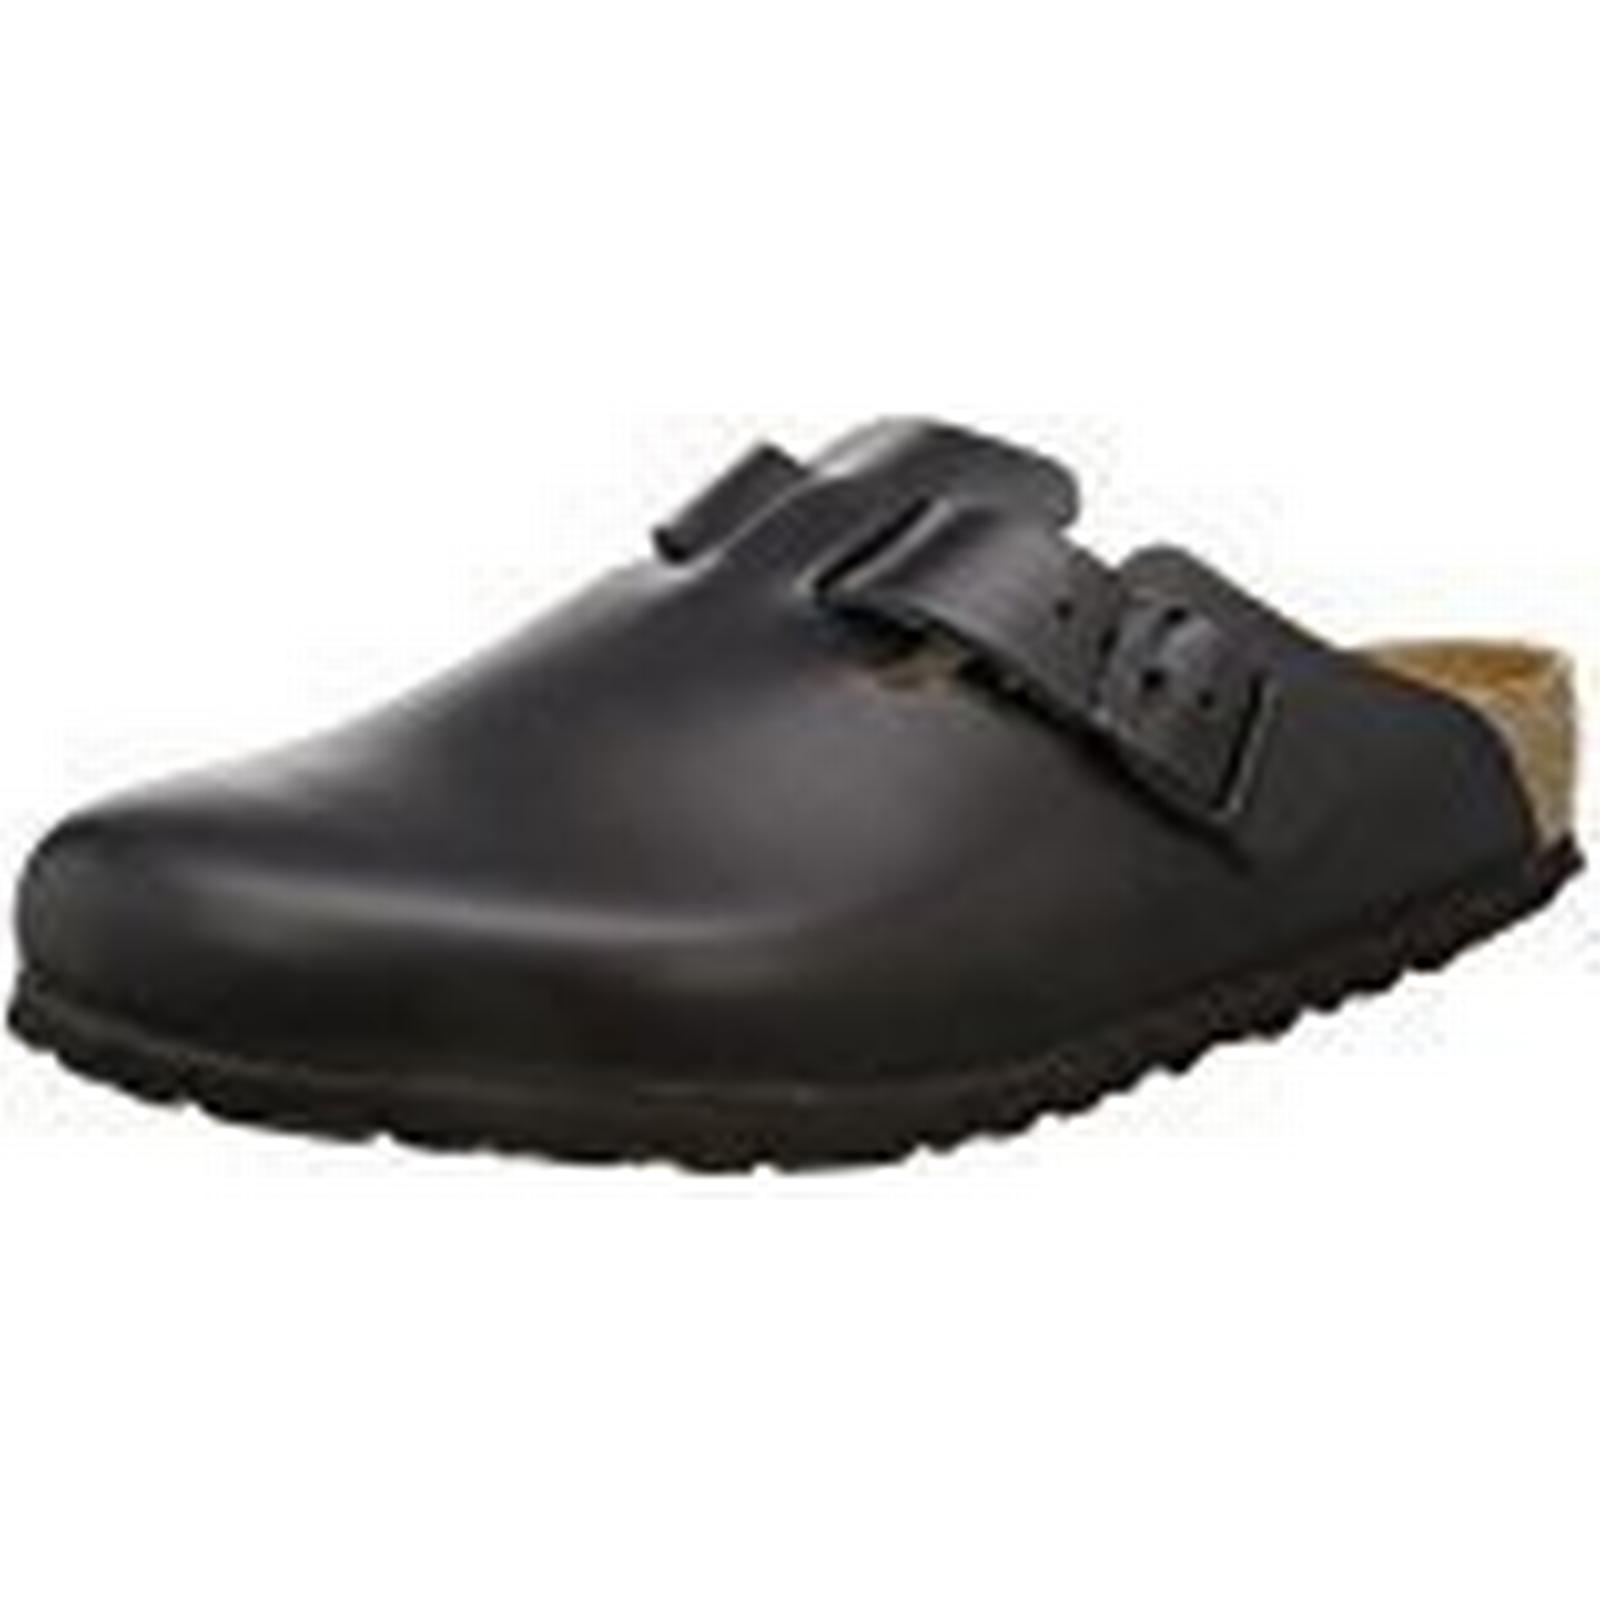 Birkenstock Boston Clog Black - EU Size 7 40 / UK Size 7 Size 02b637